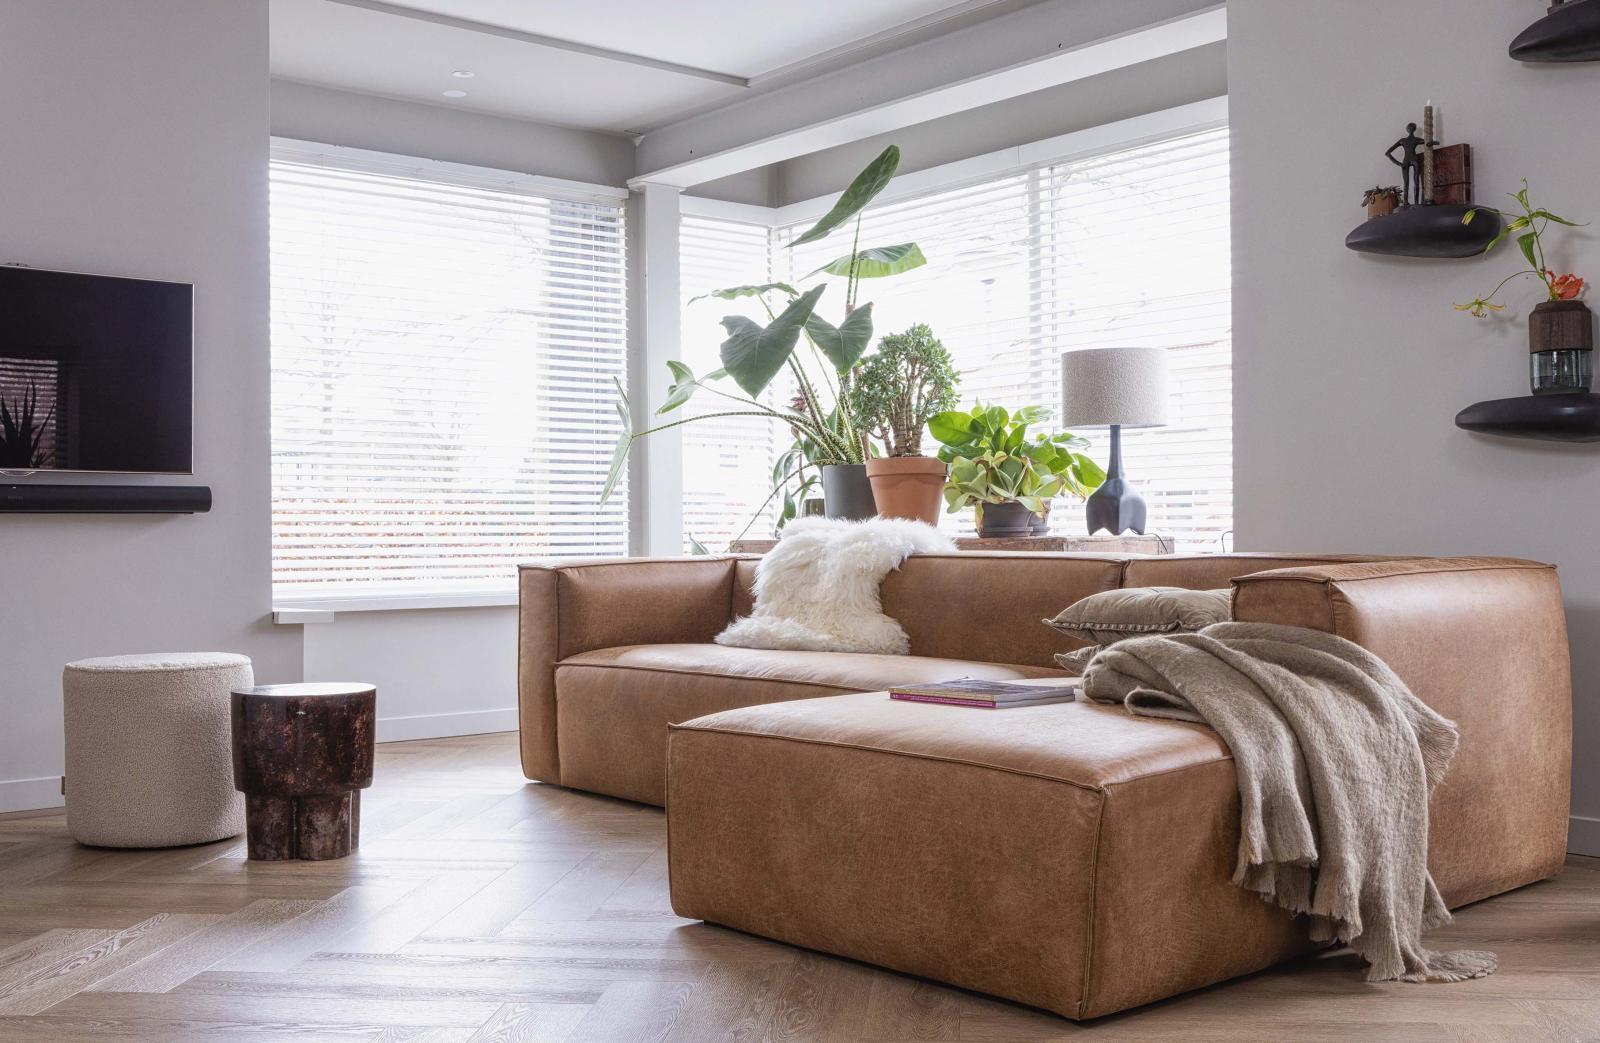 eckcouch braun good ecksofa kunstleder vintage ue sofa couch leder braun lkombi ecksofa. Black Bedroom Furniture Sets. Home Design Ideas